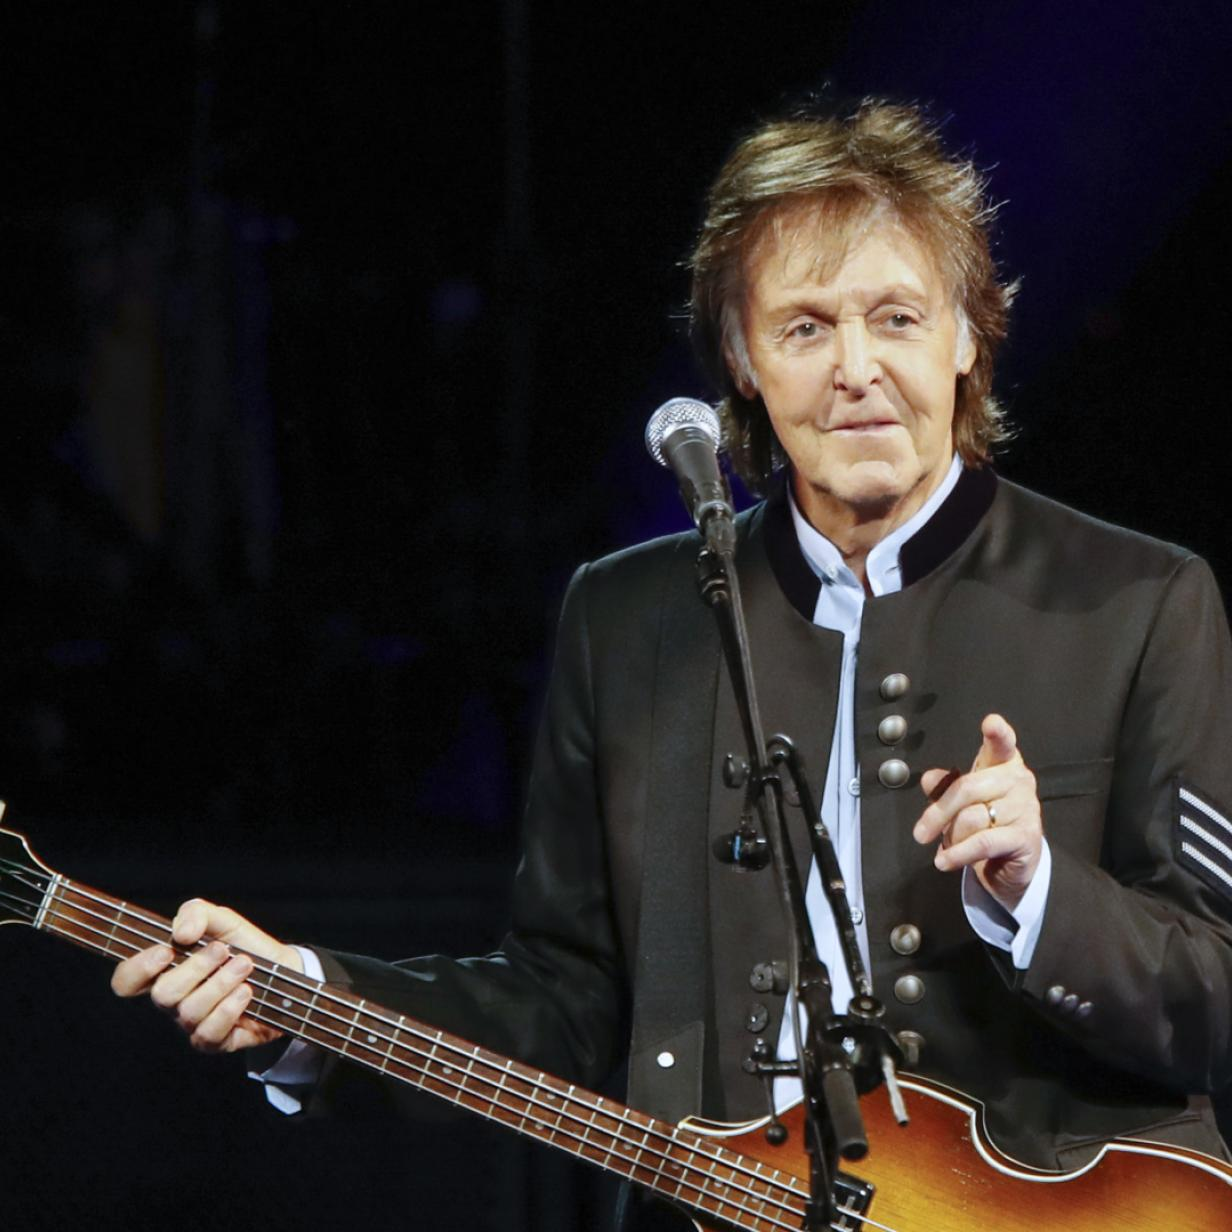 Paul McCartney ist Stargast des 50. Glastonbury-Musikfestivals